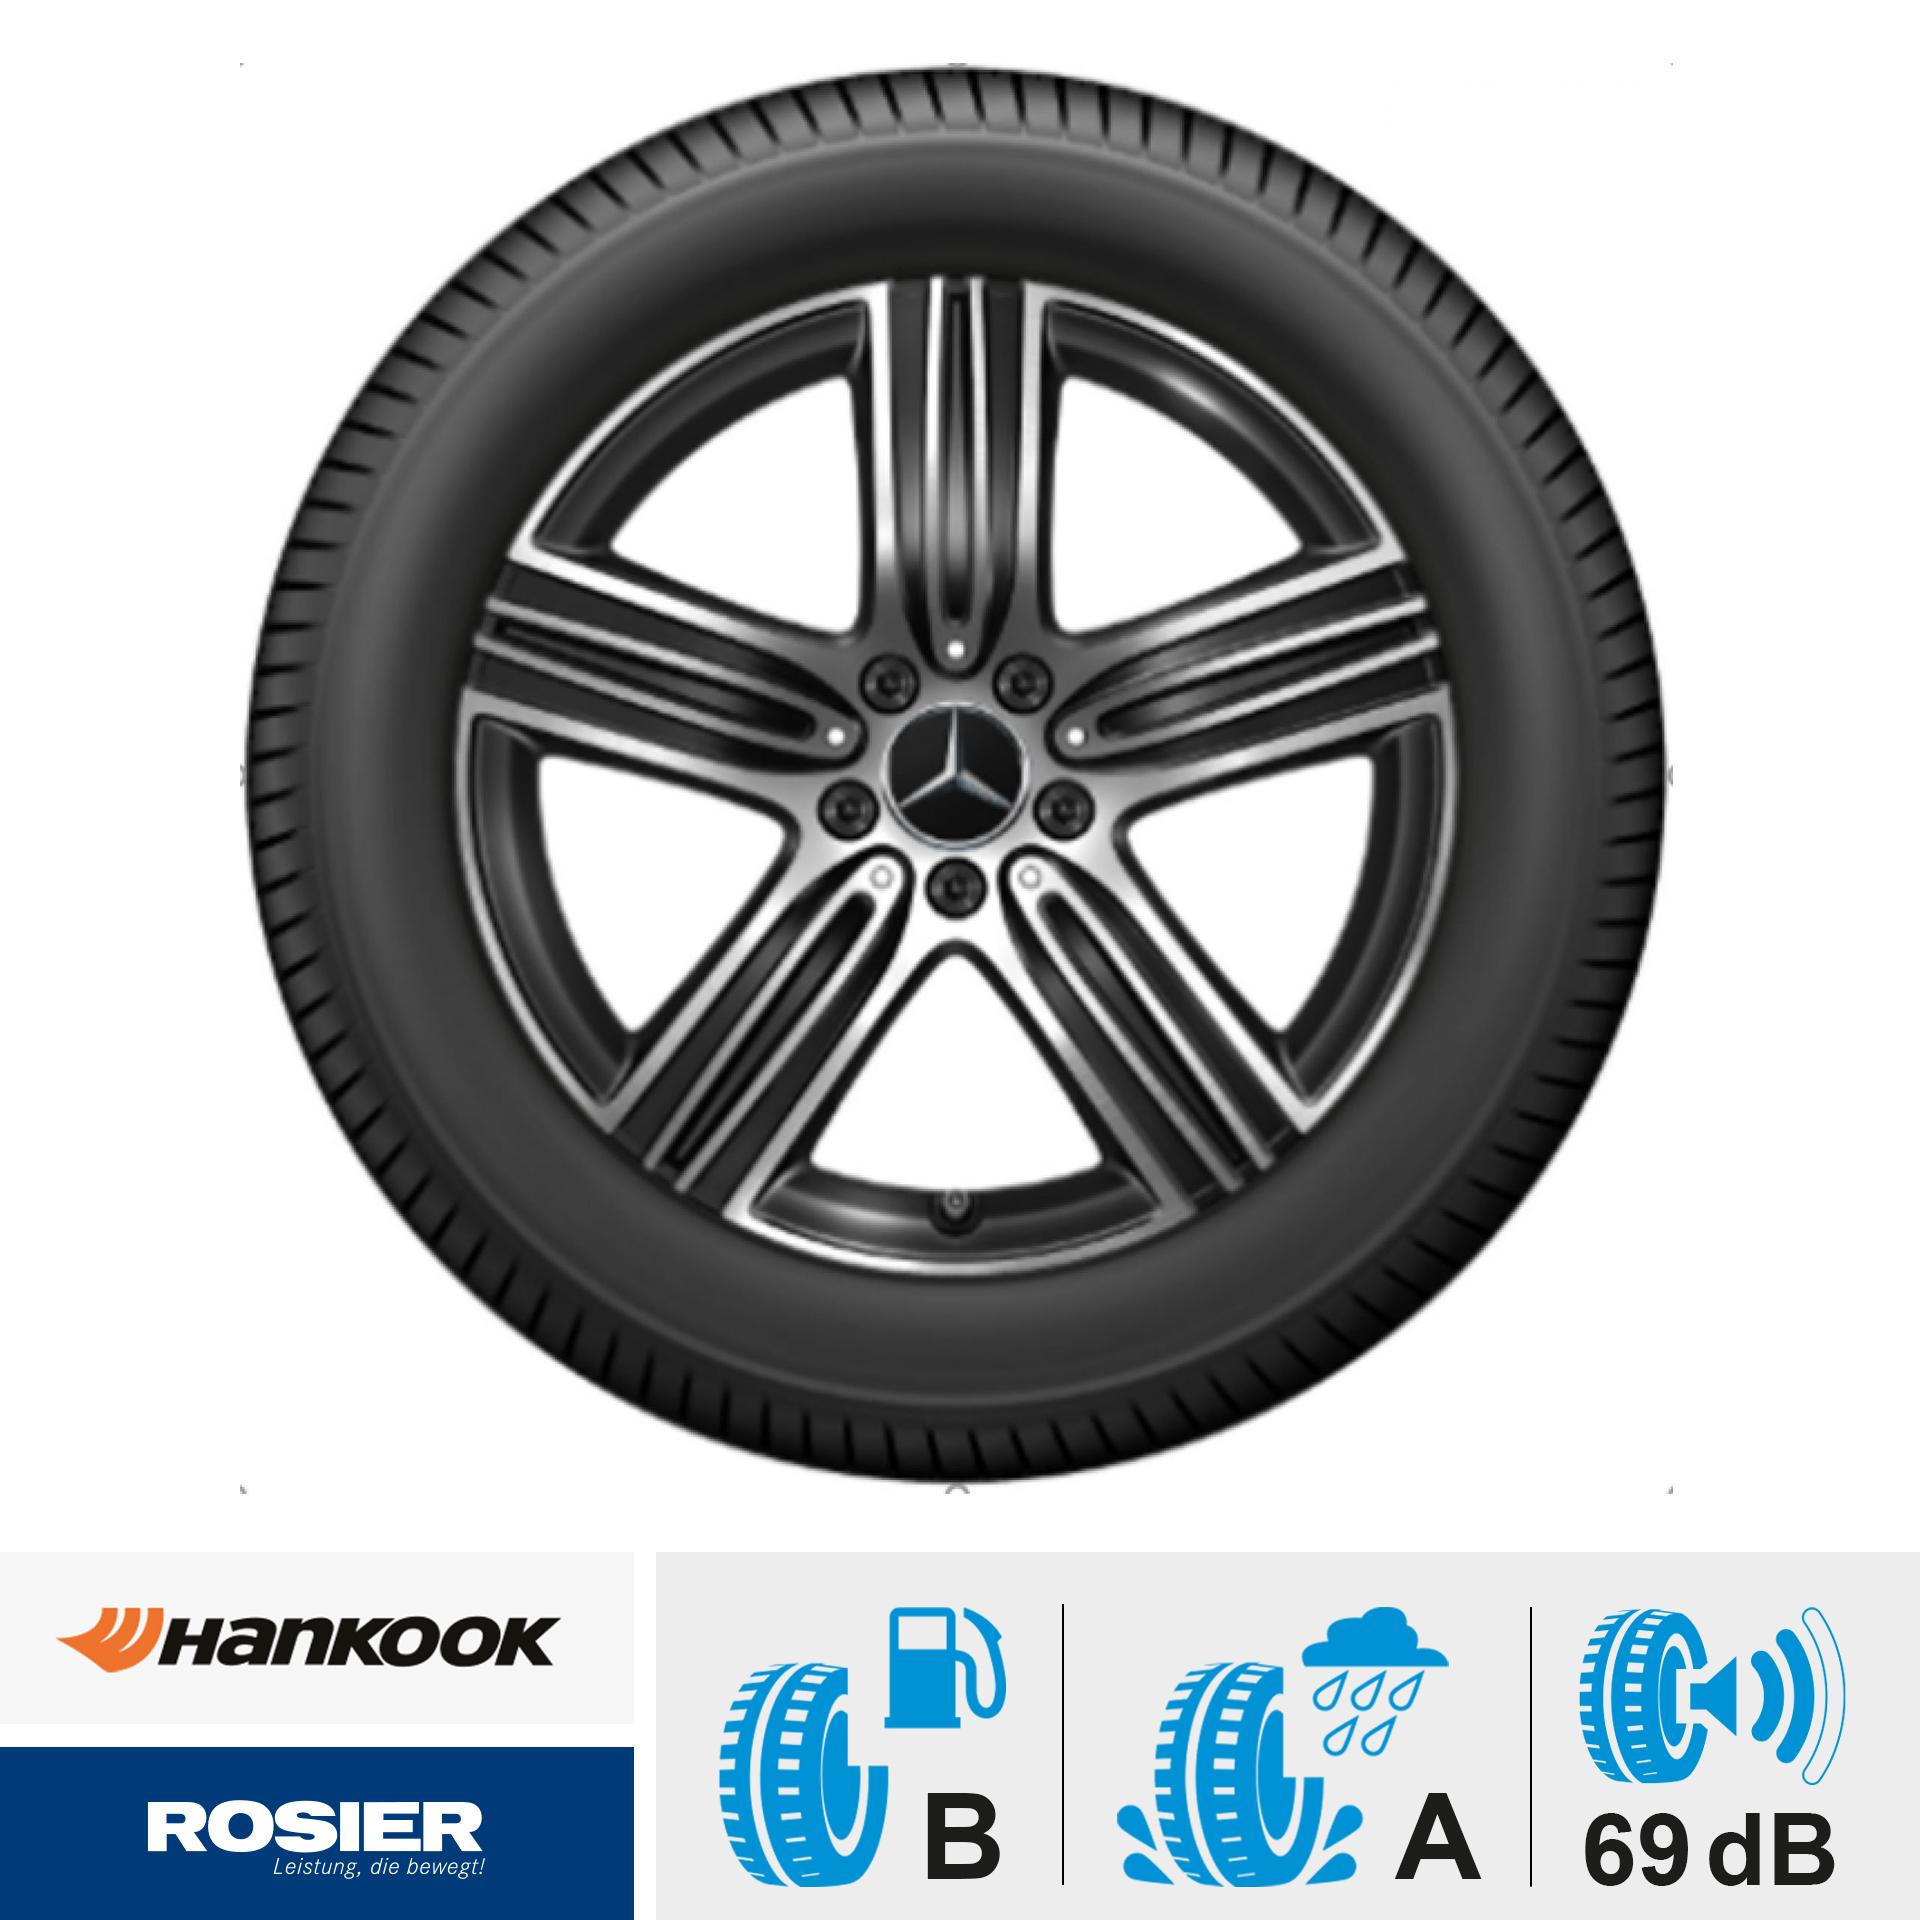 Sommerkomplettrad 5-Speichen-Rad schwarz glanzgedreht Michelin Primacy 4 MO 235/55 R18 100W / Mercedes-Benz  GLA/GLB Felgen